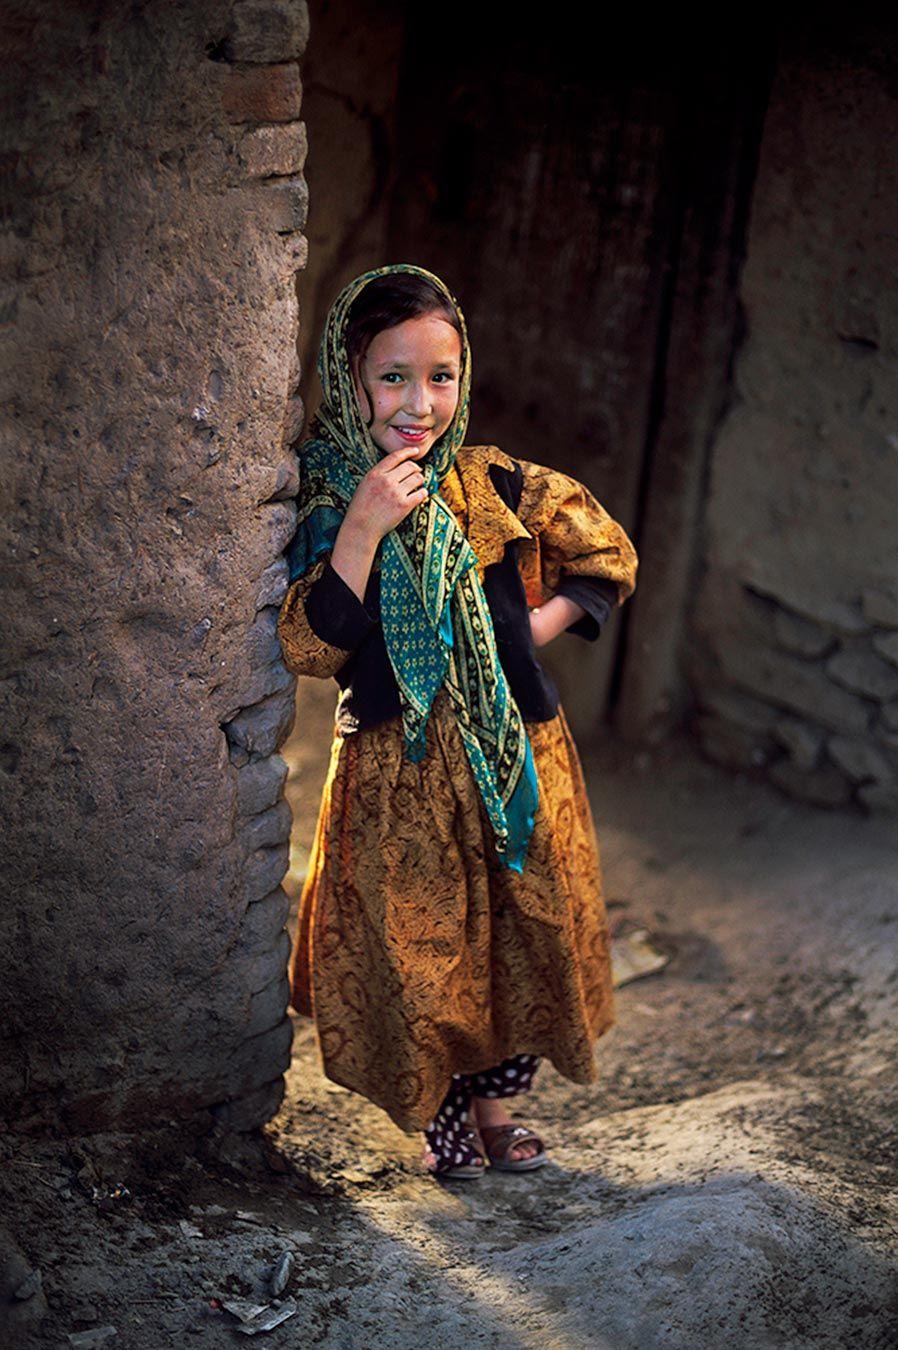 Fine Art Prints | Steve McCurry smiling girl in Afghan